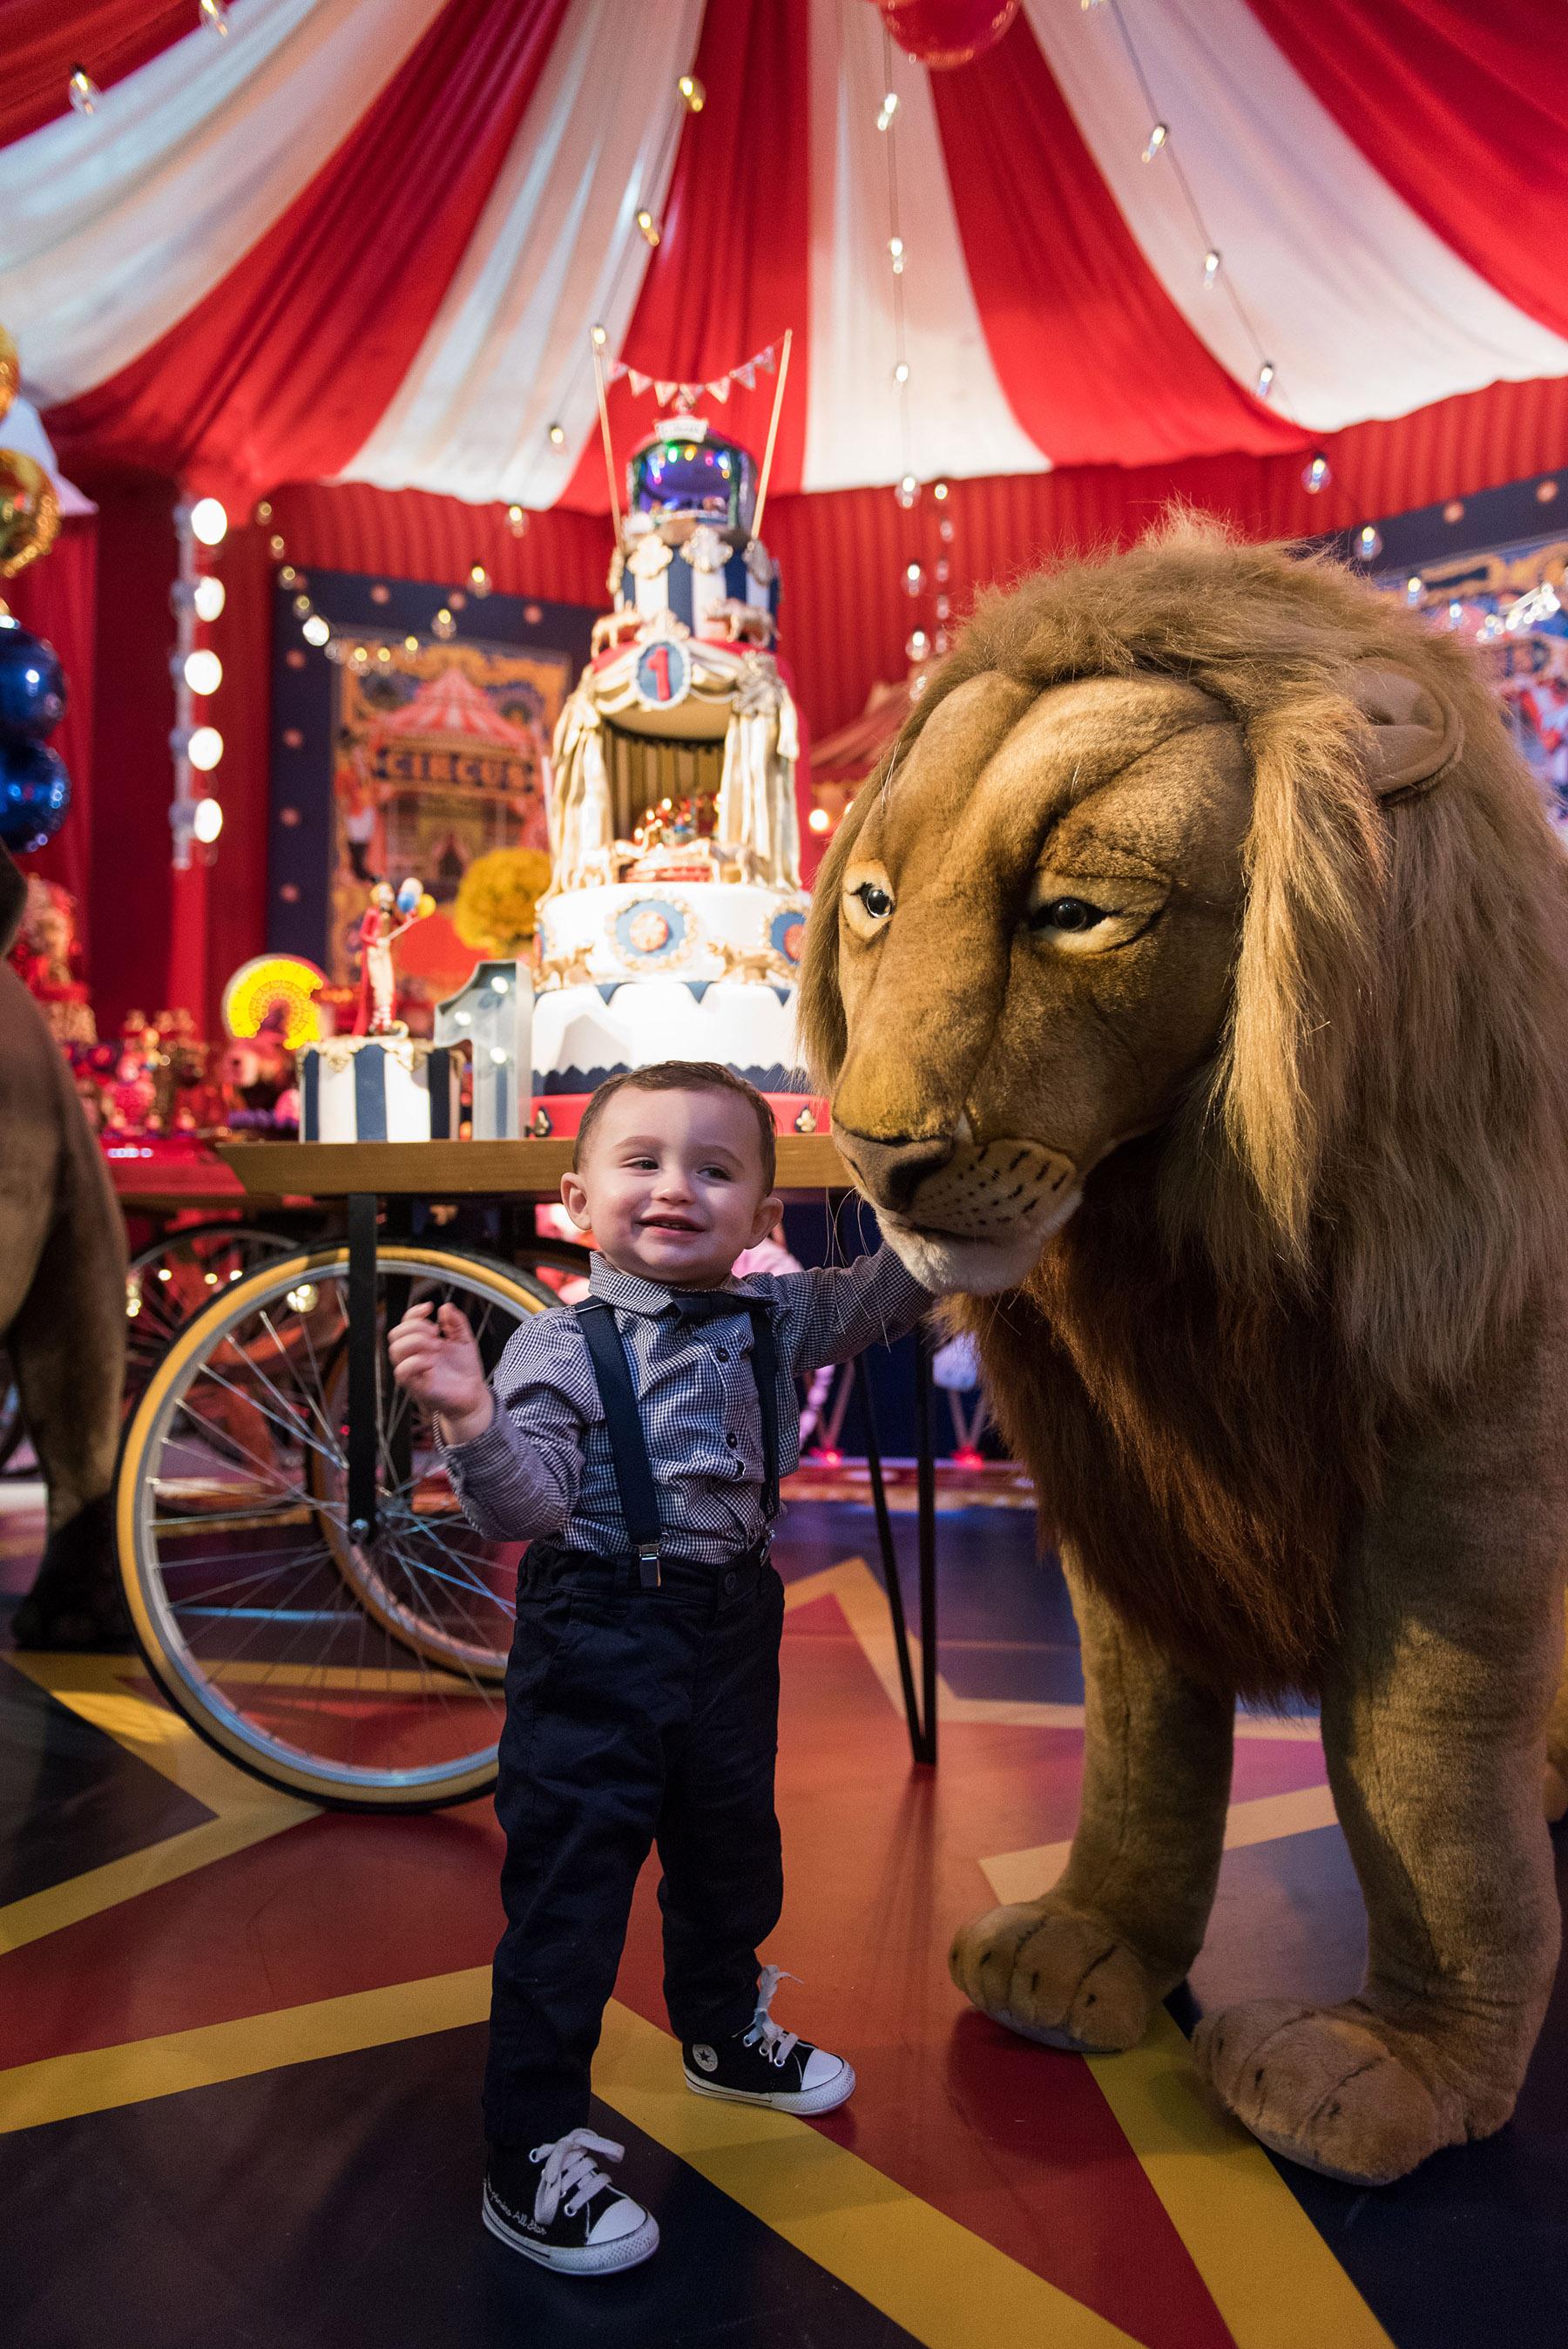 50_festa_infantil_curitiba_tema_circo.jpg